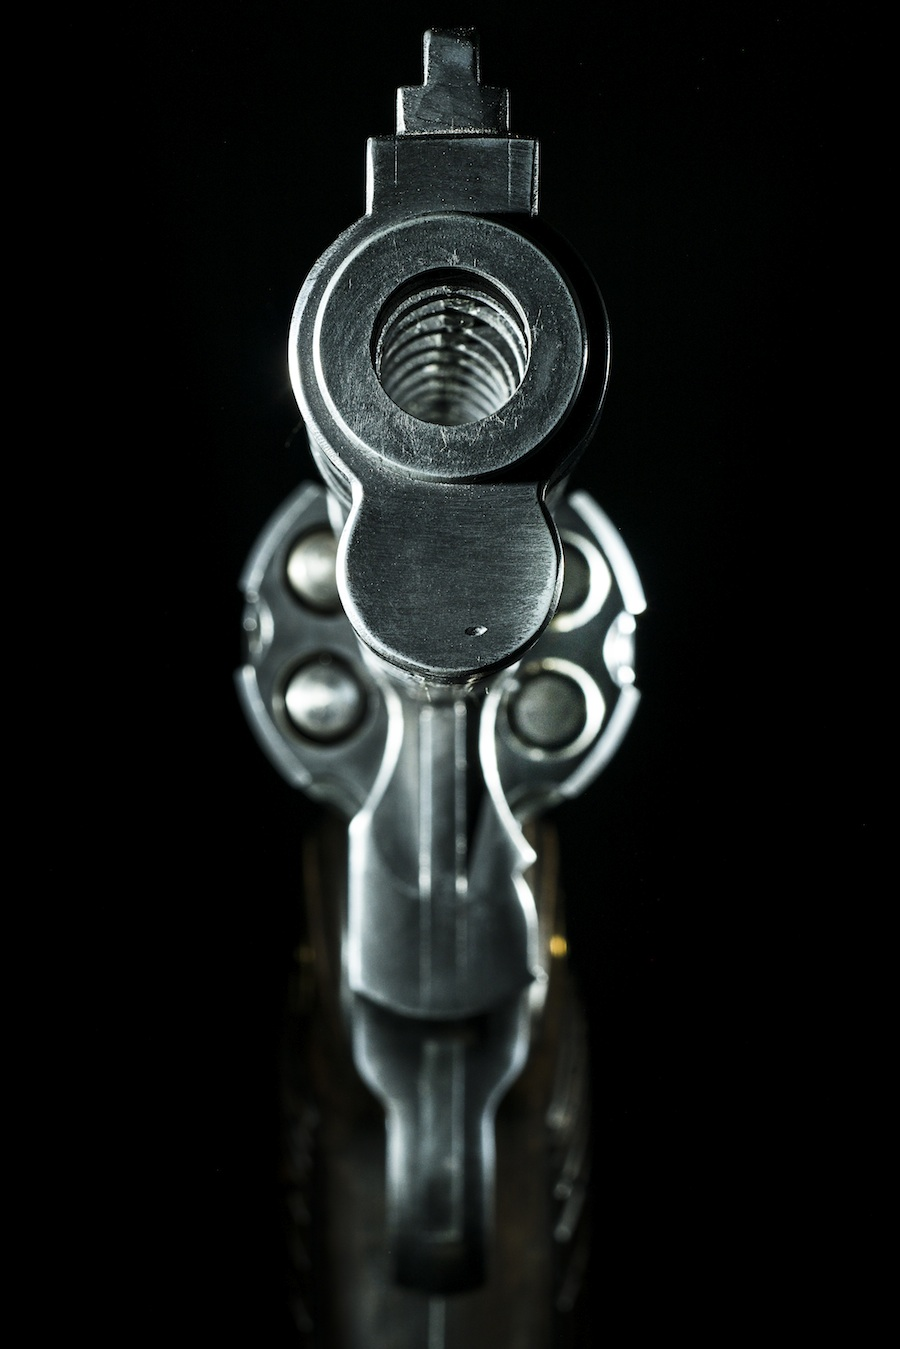 jean-octobon-colt-magnum-357.jpg